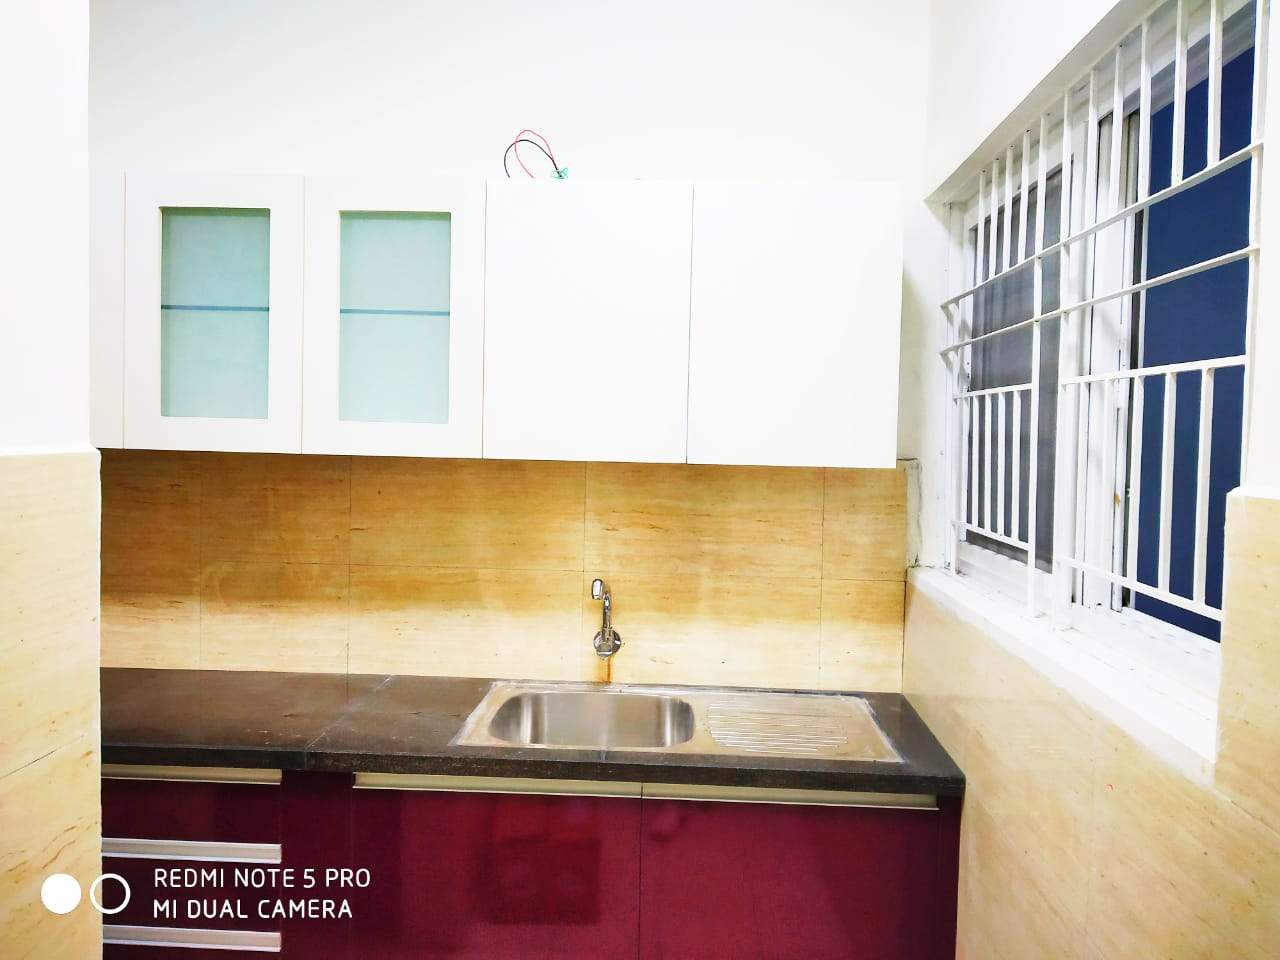 BSCPL-Bollineni-Astra-Kogilu-Cross-Apartments-Bangalore-Gallery-11